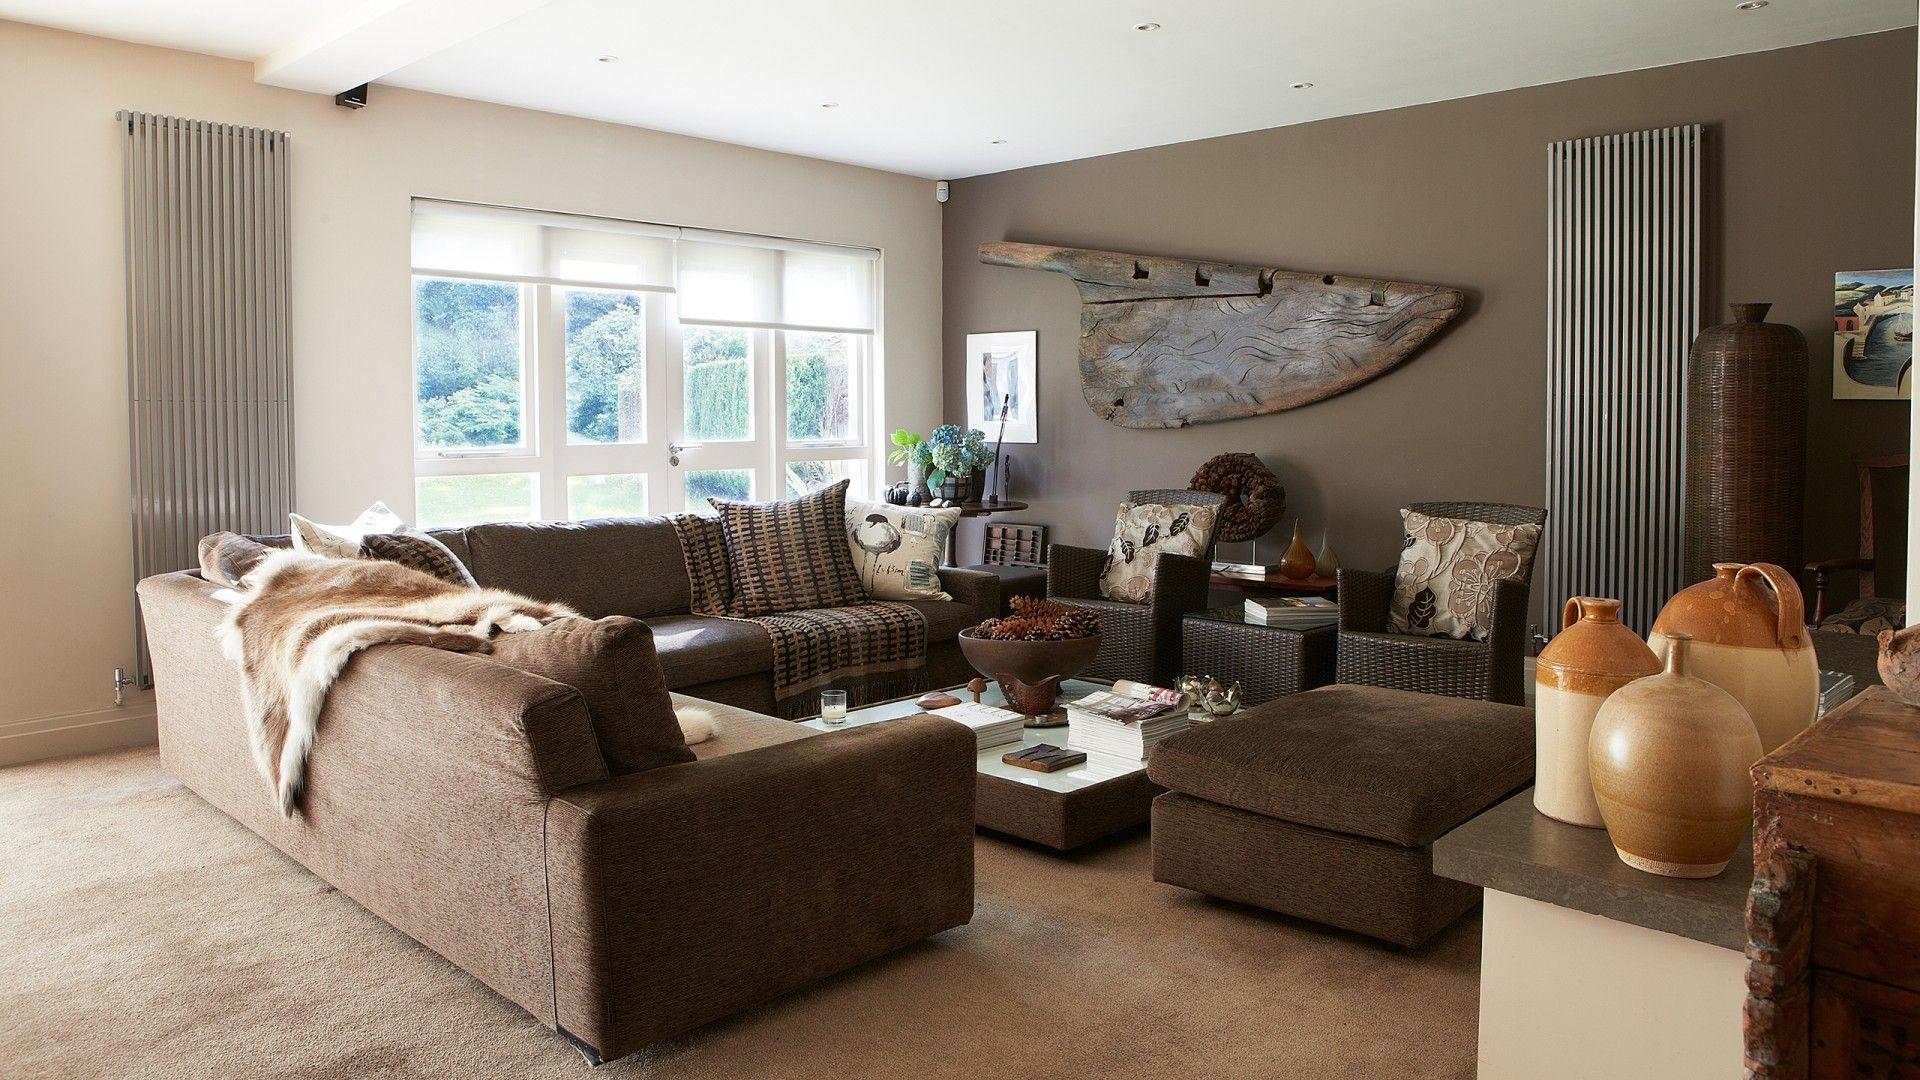 Modern Mushbroom Brown Living Room With Corner Sofa